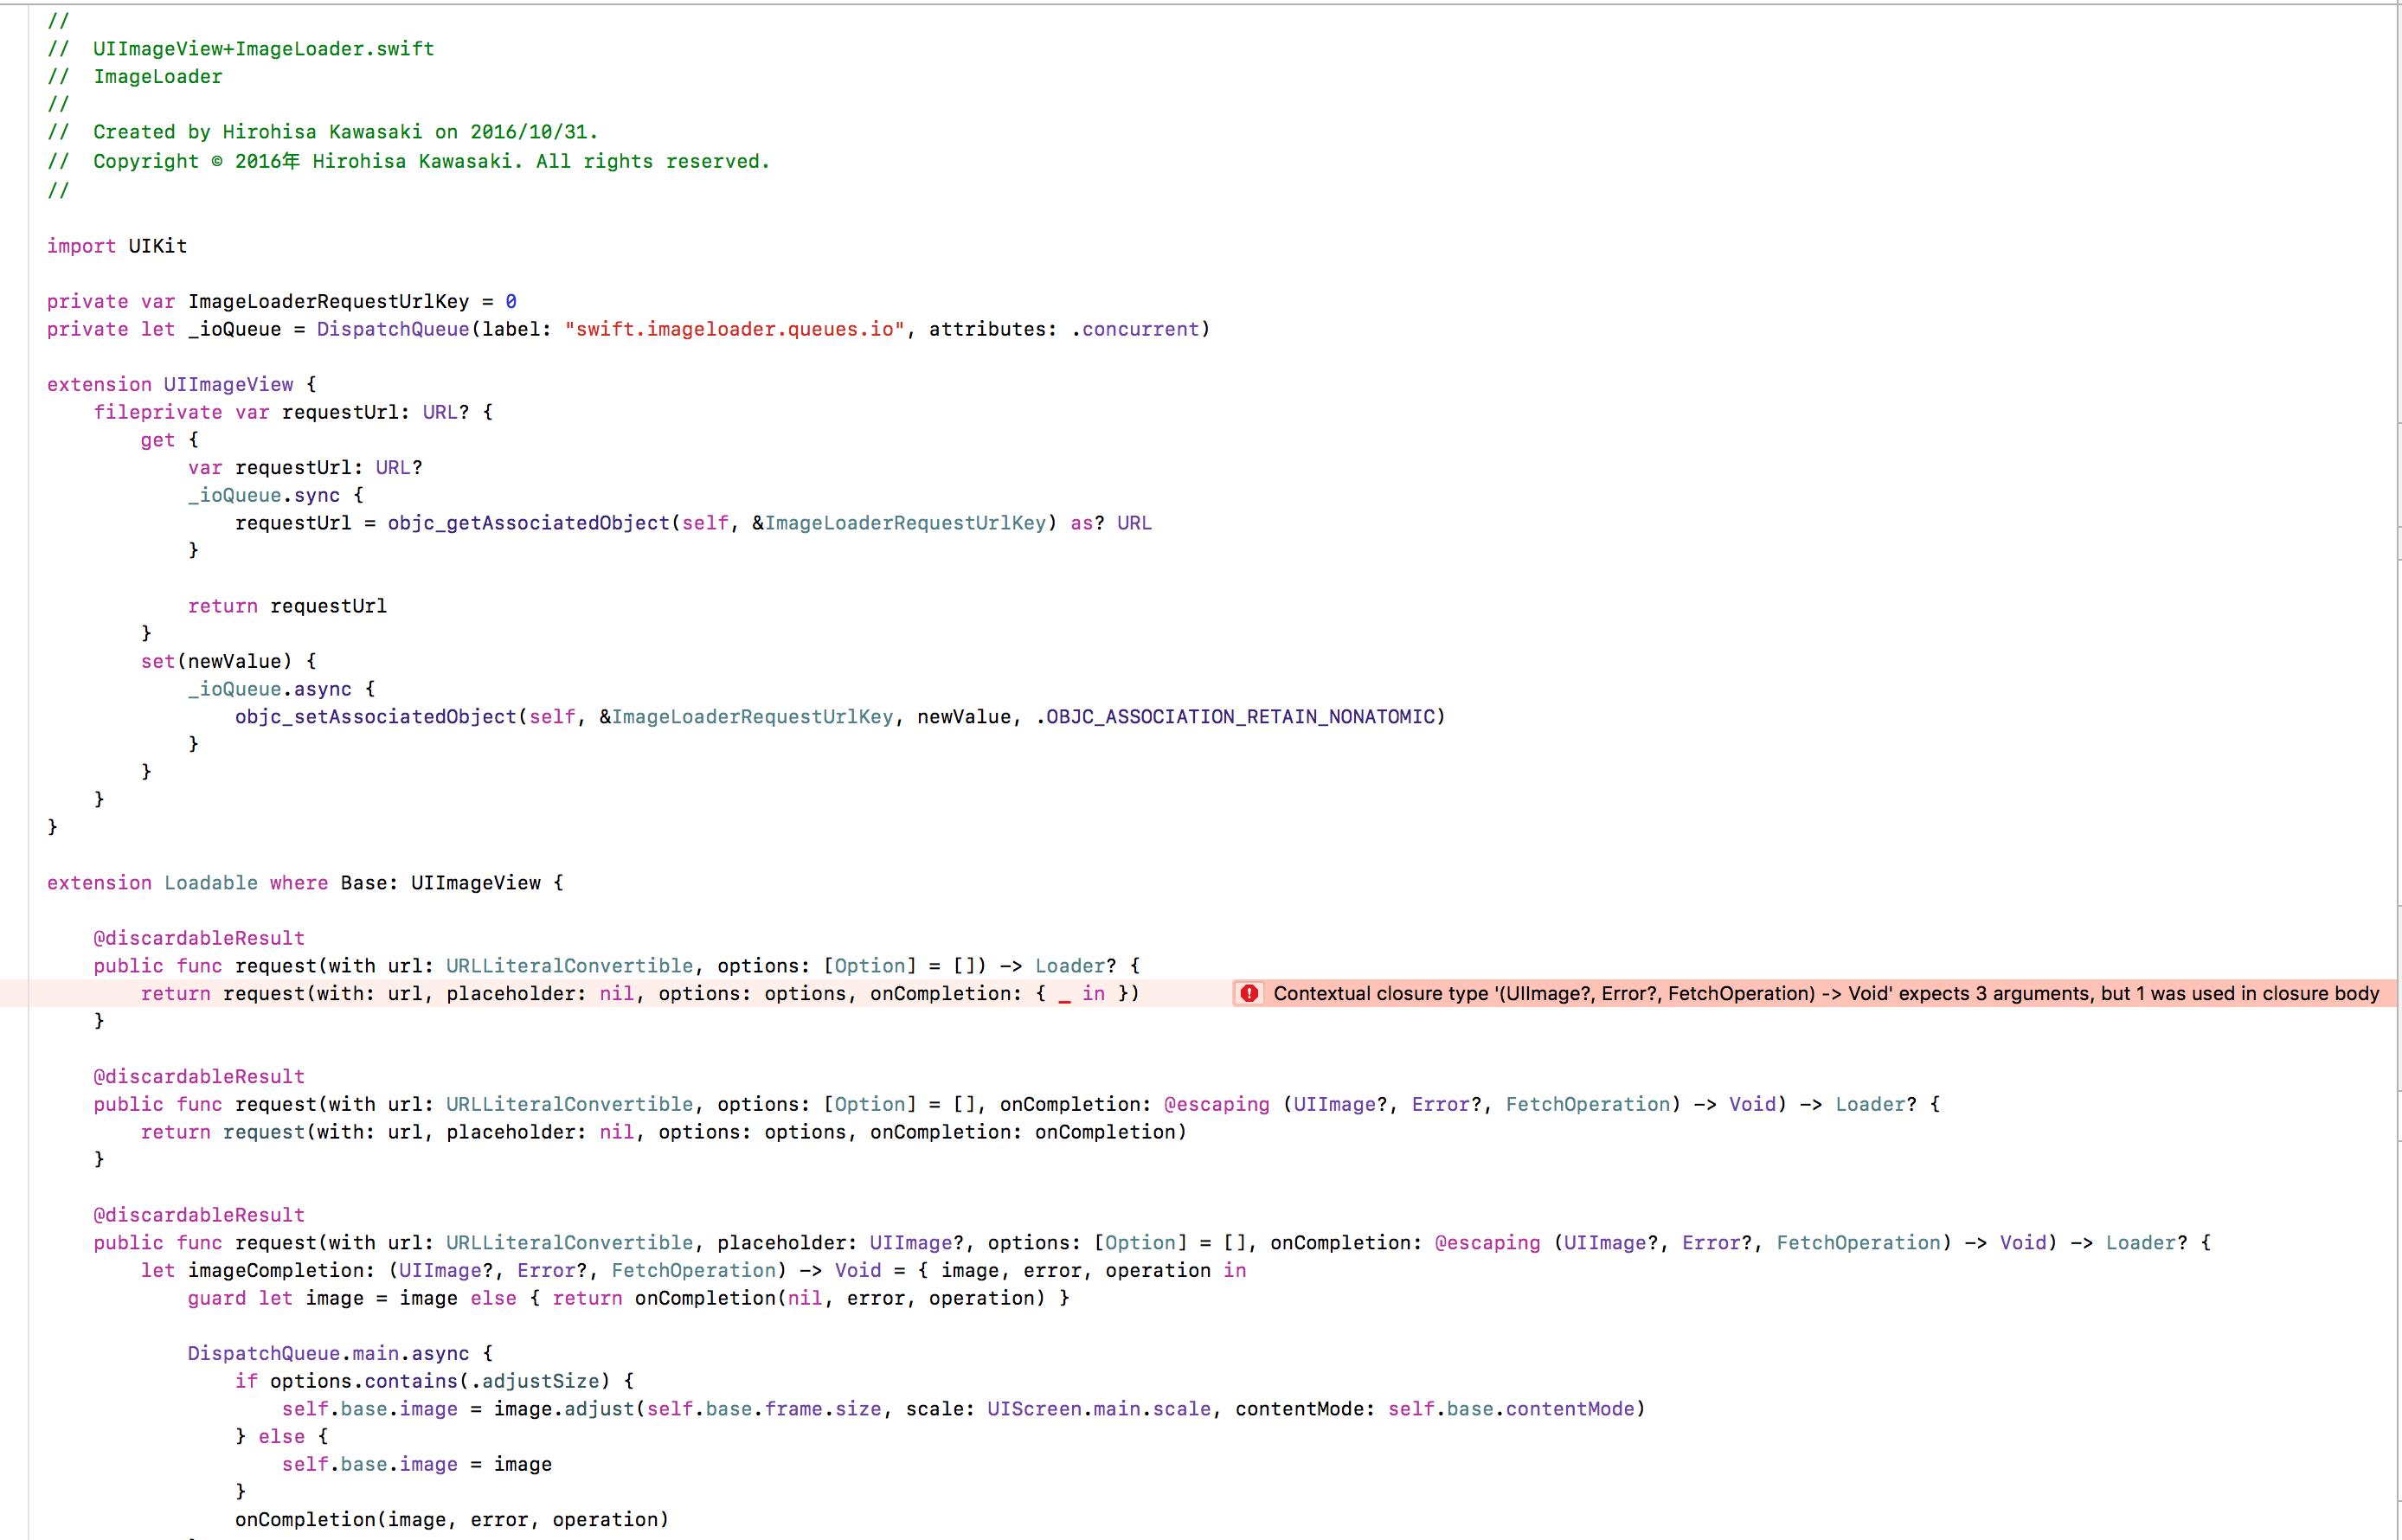 Swift 4 0, iOS 11 Support · Issue #107 · hirohisa